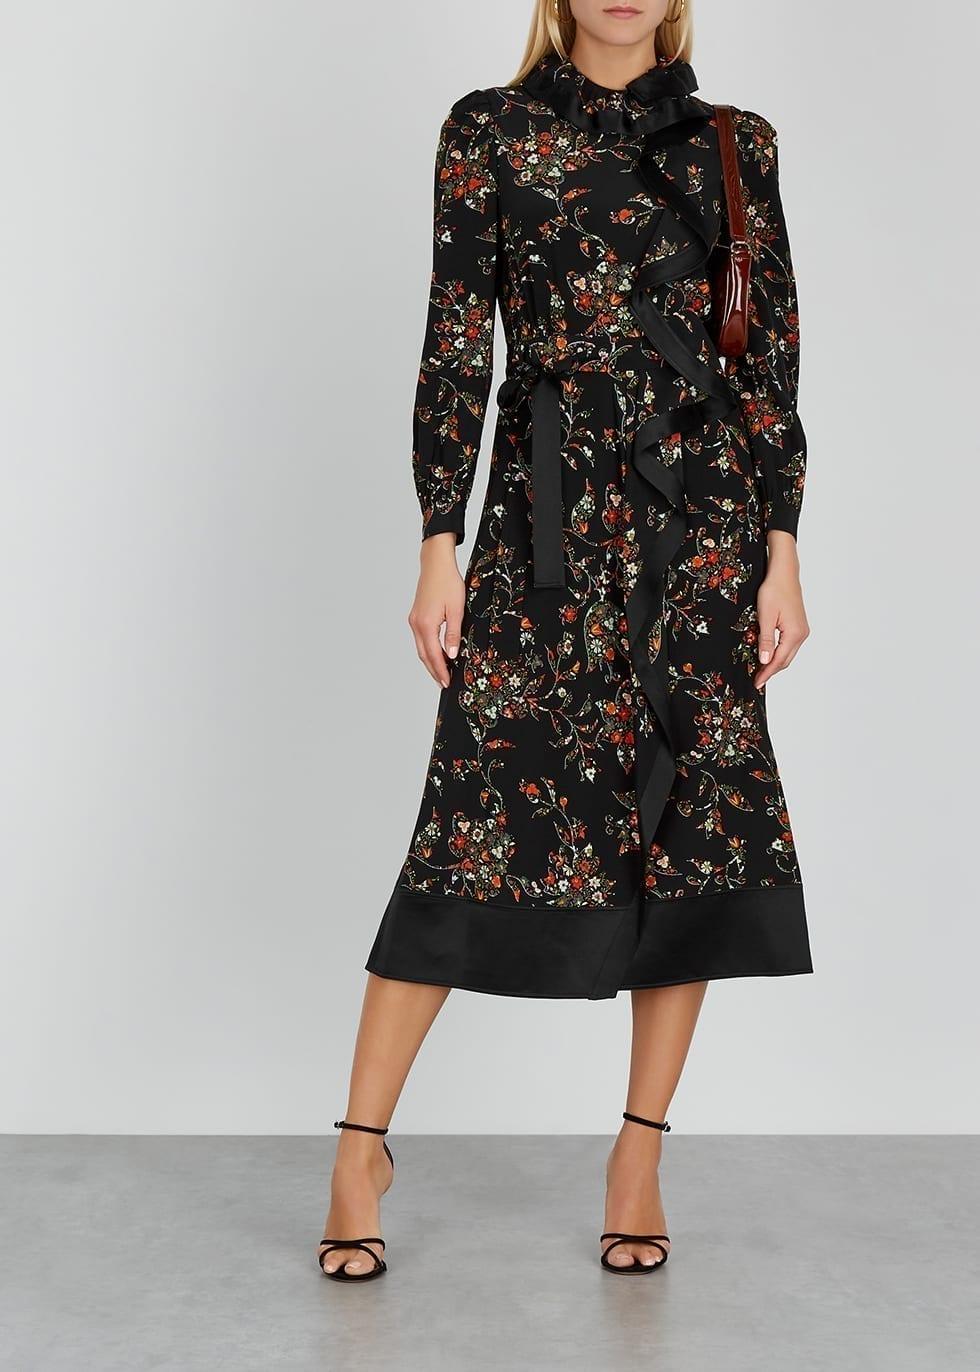 TORY BURCH Floral-print Ruffled Silk Midi Dress